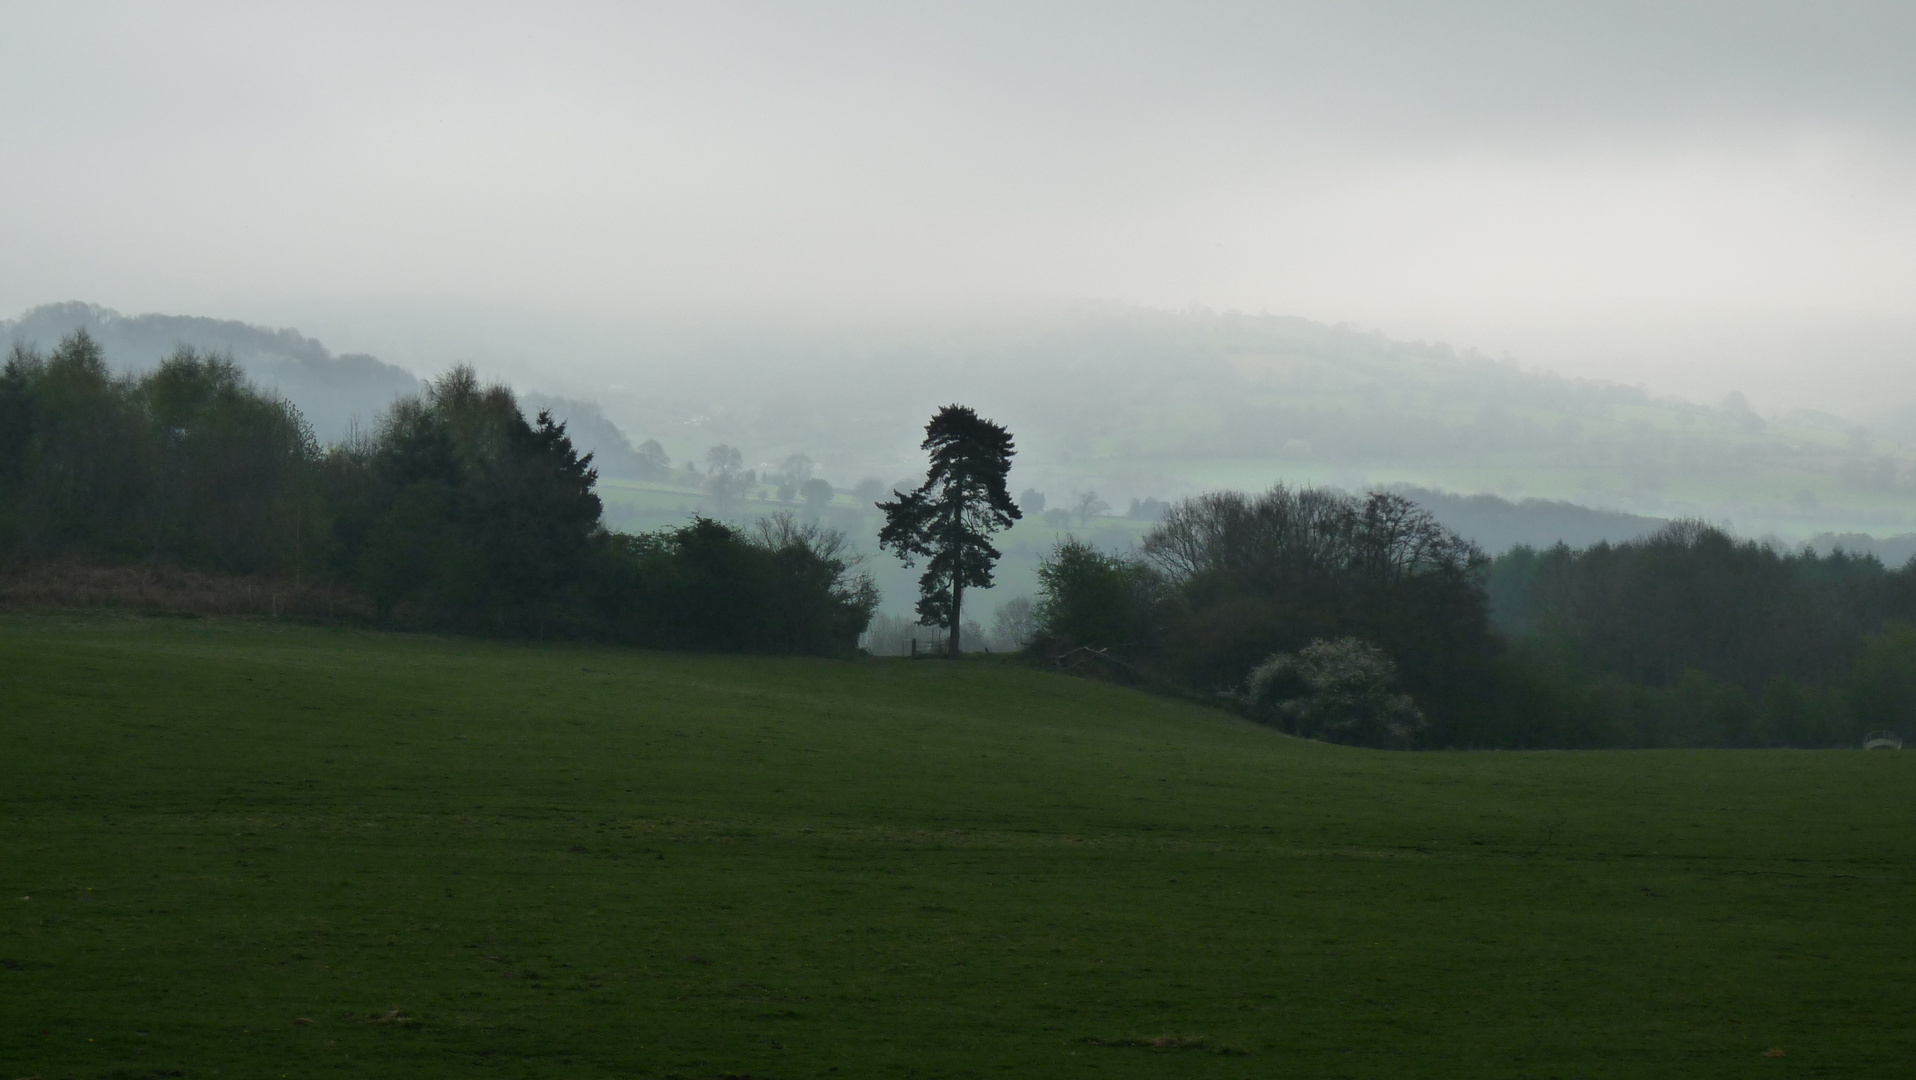 near Crickhowell, Brecon Beacons